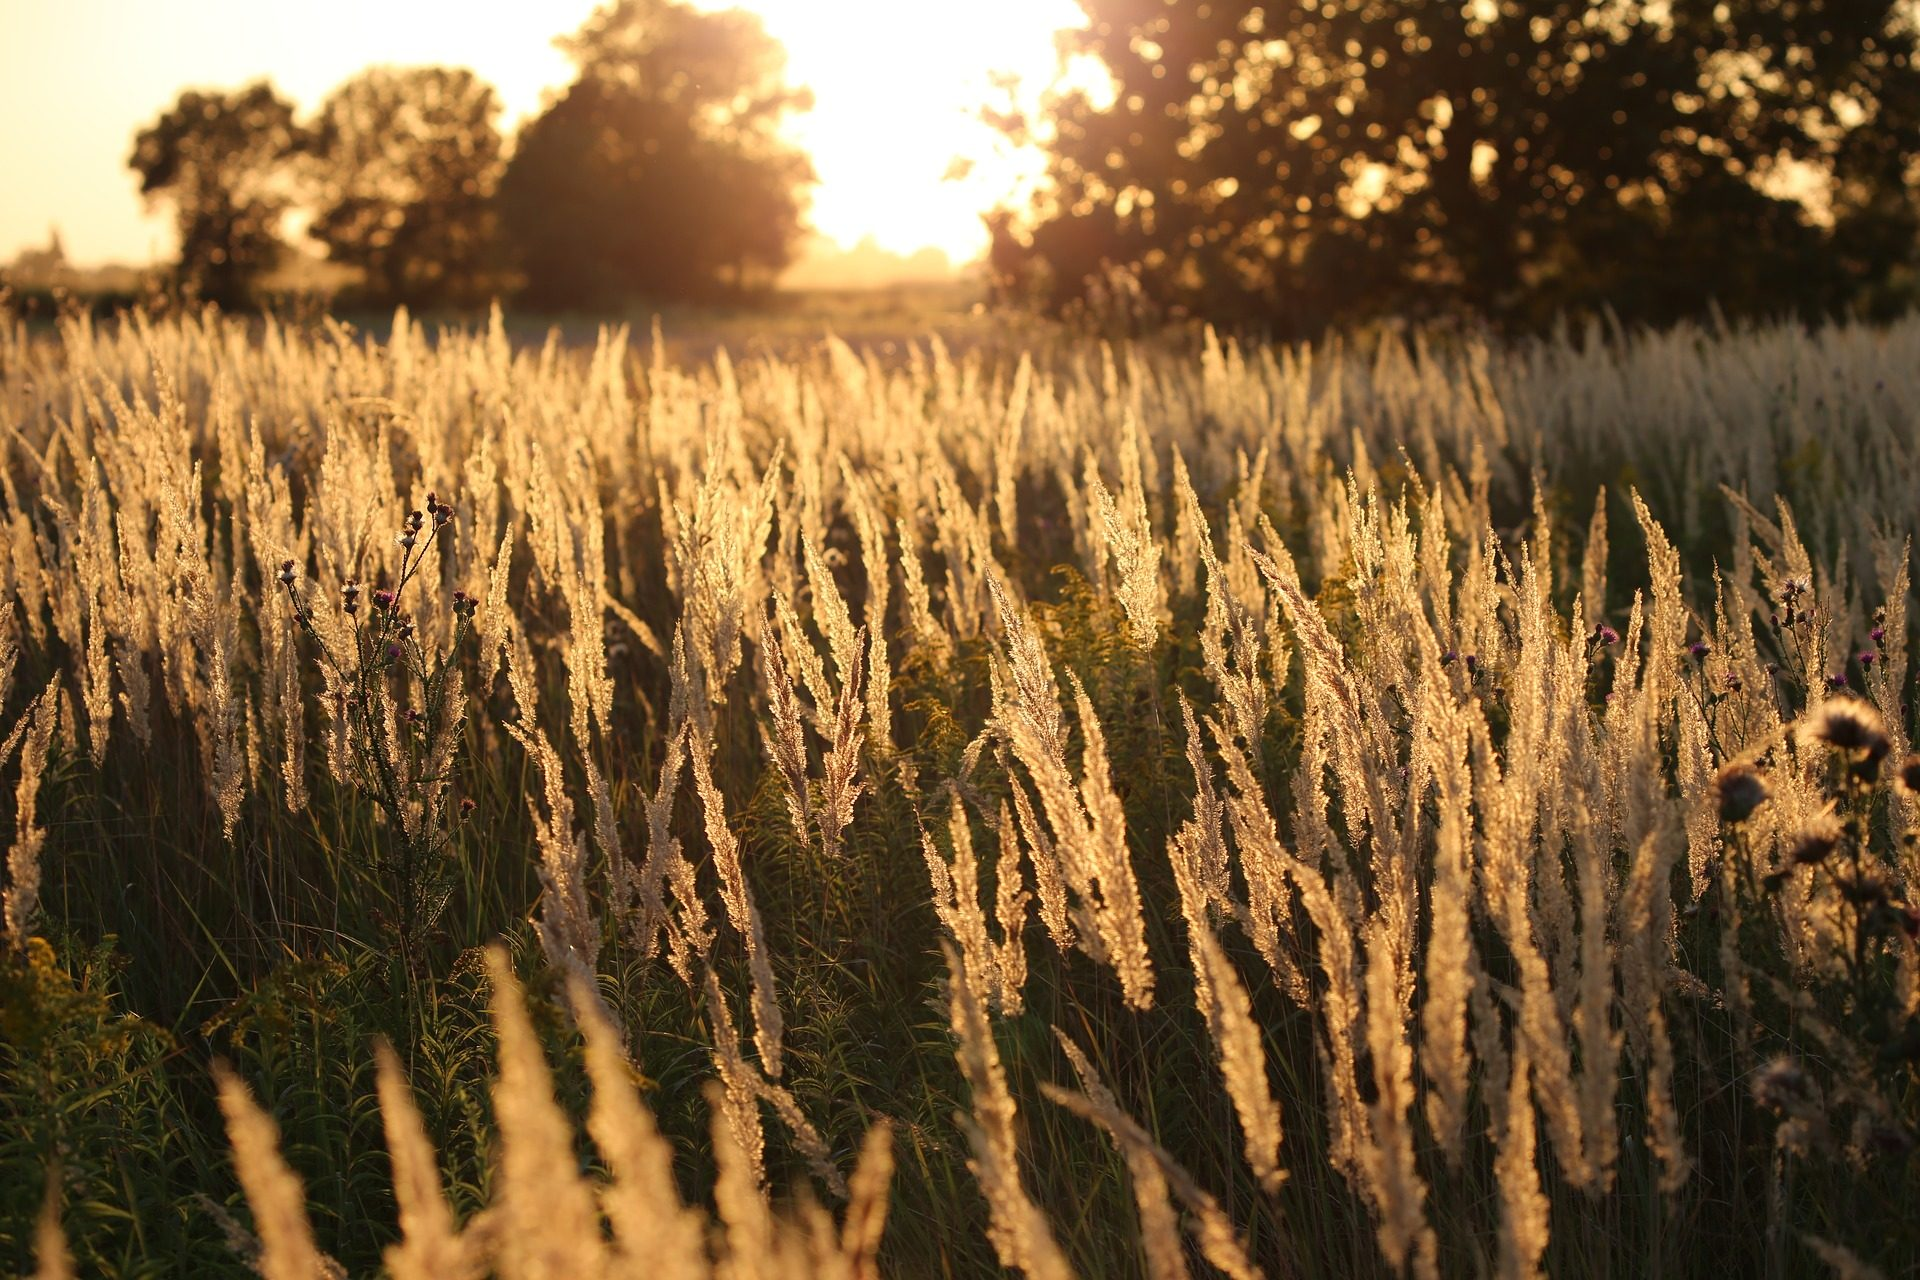 campo, grama, plantas, Pôr do sol, luz, Sol, árvores - Papéis de parede HD - Professor-falken.com